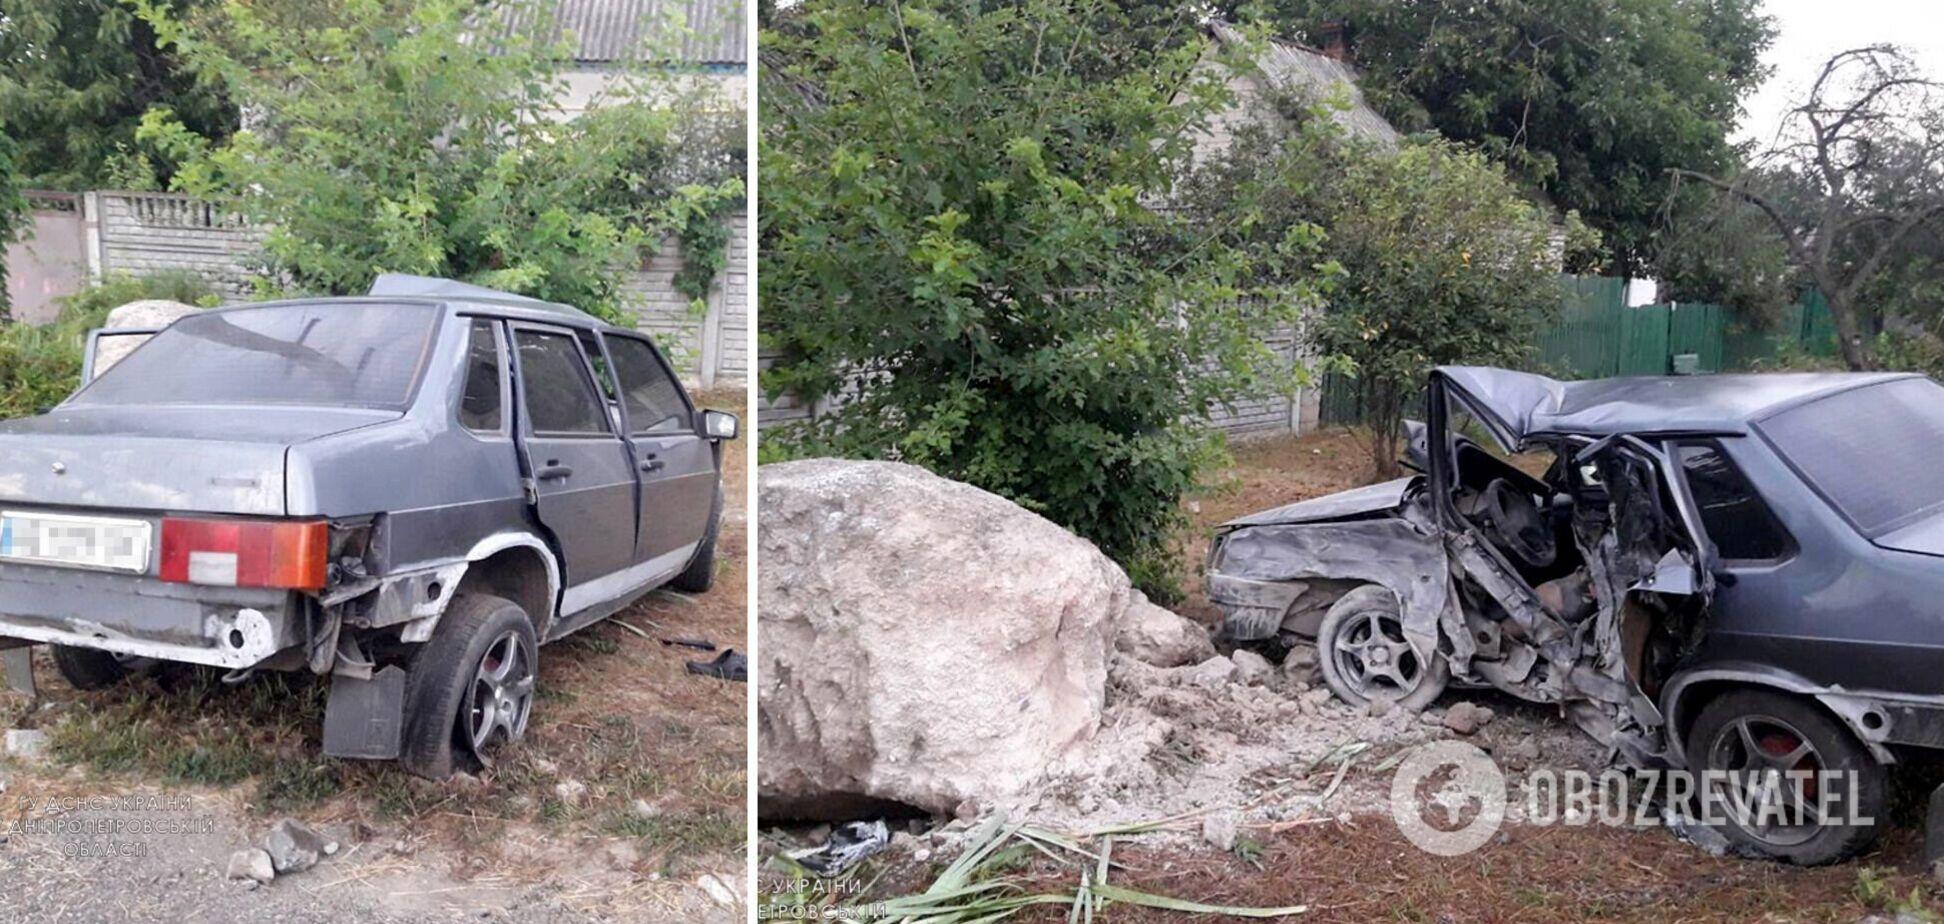 На Днепропетровщине авто на скорости слетело с дороги, водитель погиб на месте. Фото